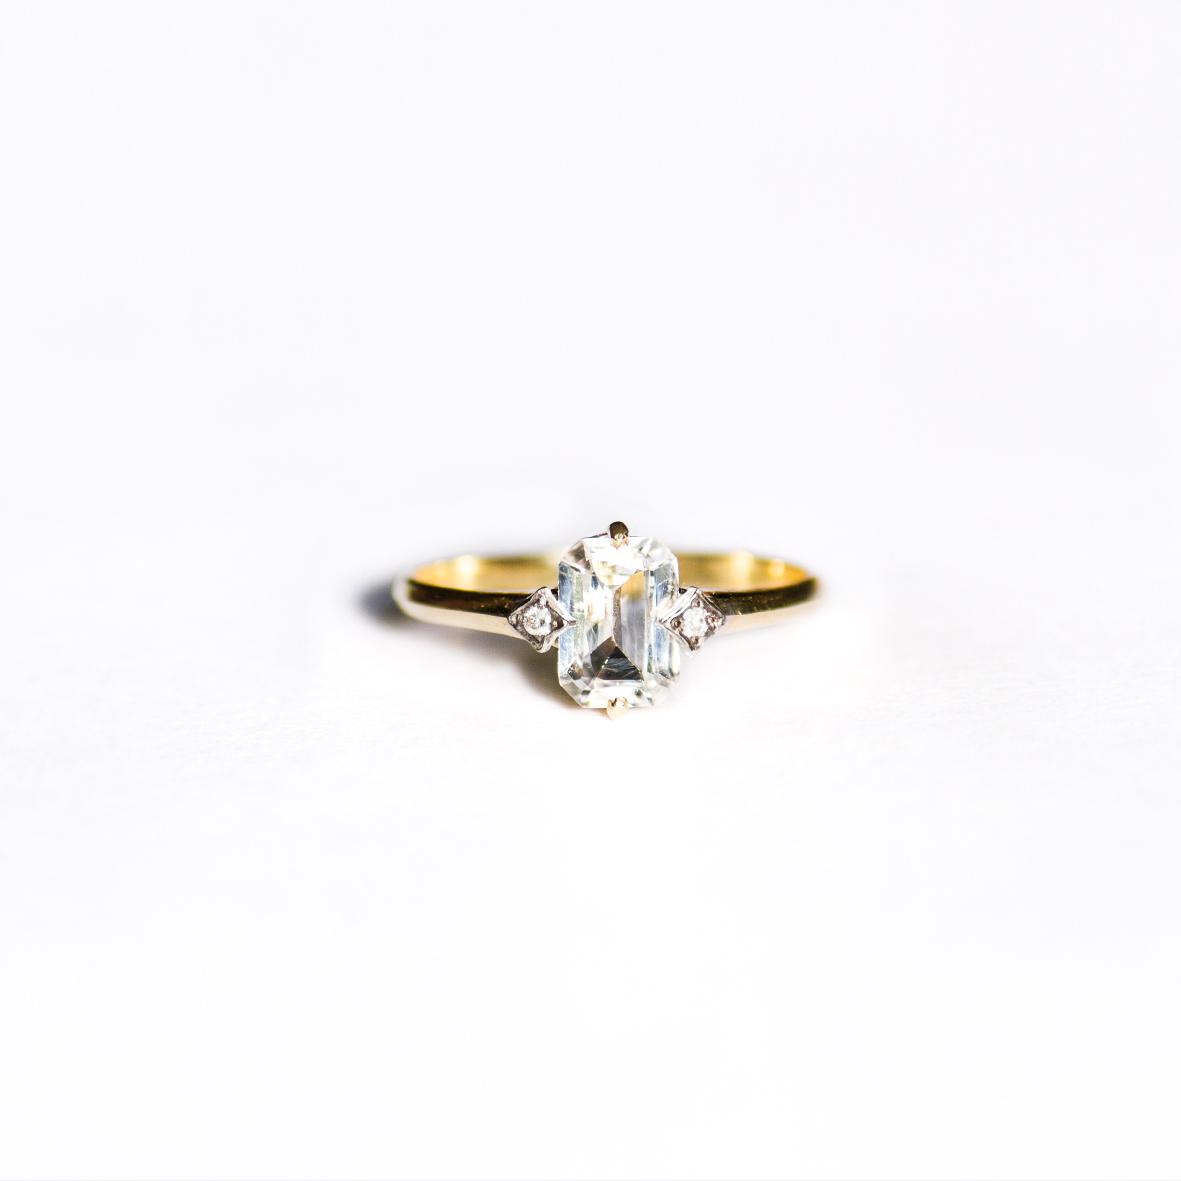 2. OONA_engagement_principal_single sapphire ring copia